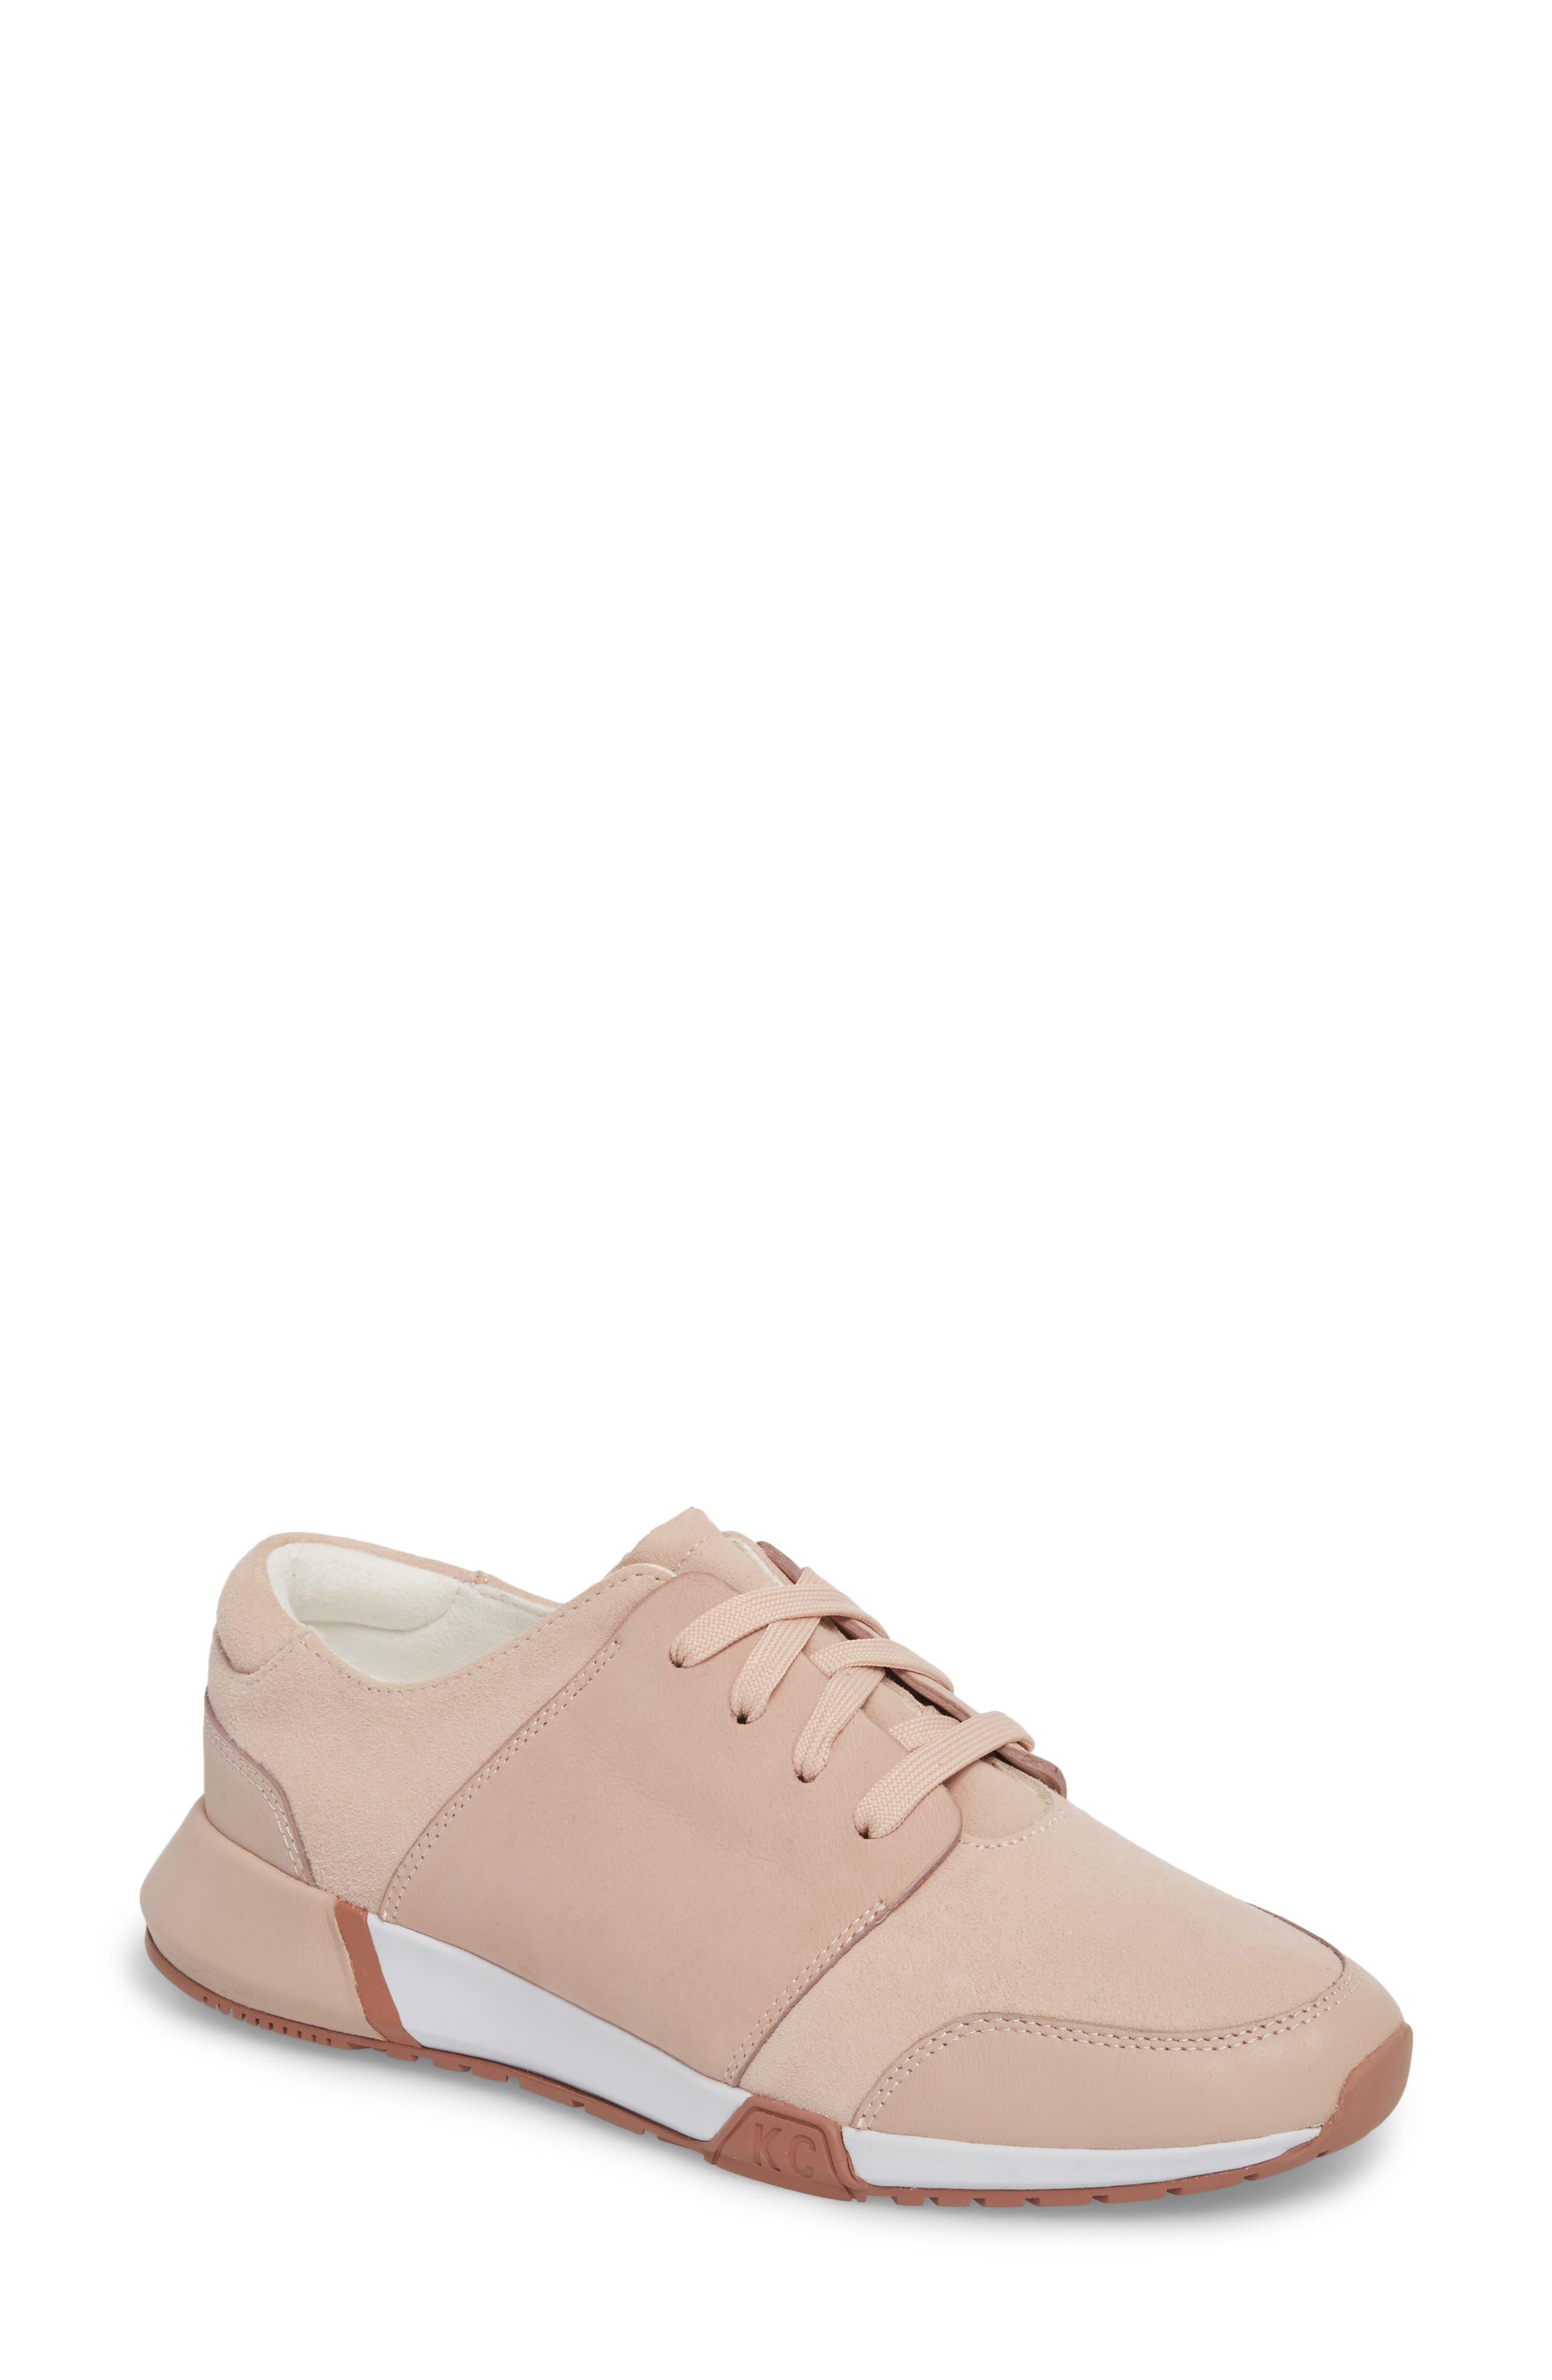 Sumner 2 Sneaker,                         Main,                         color, Rose Suede